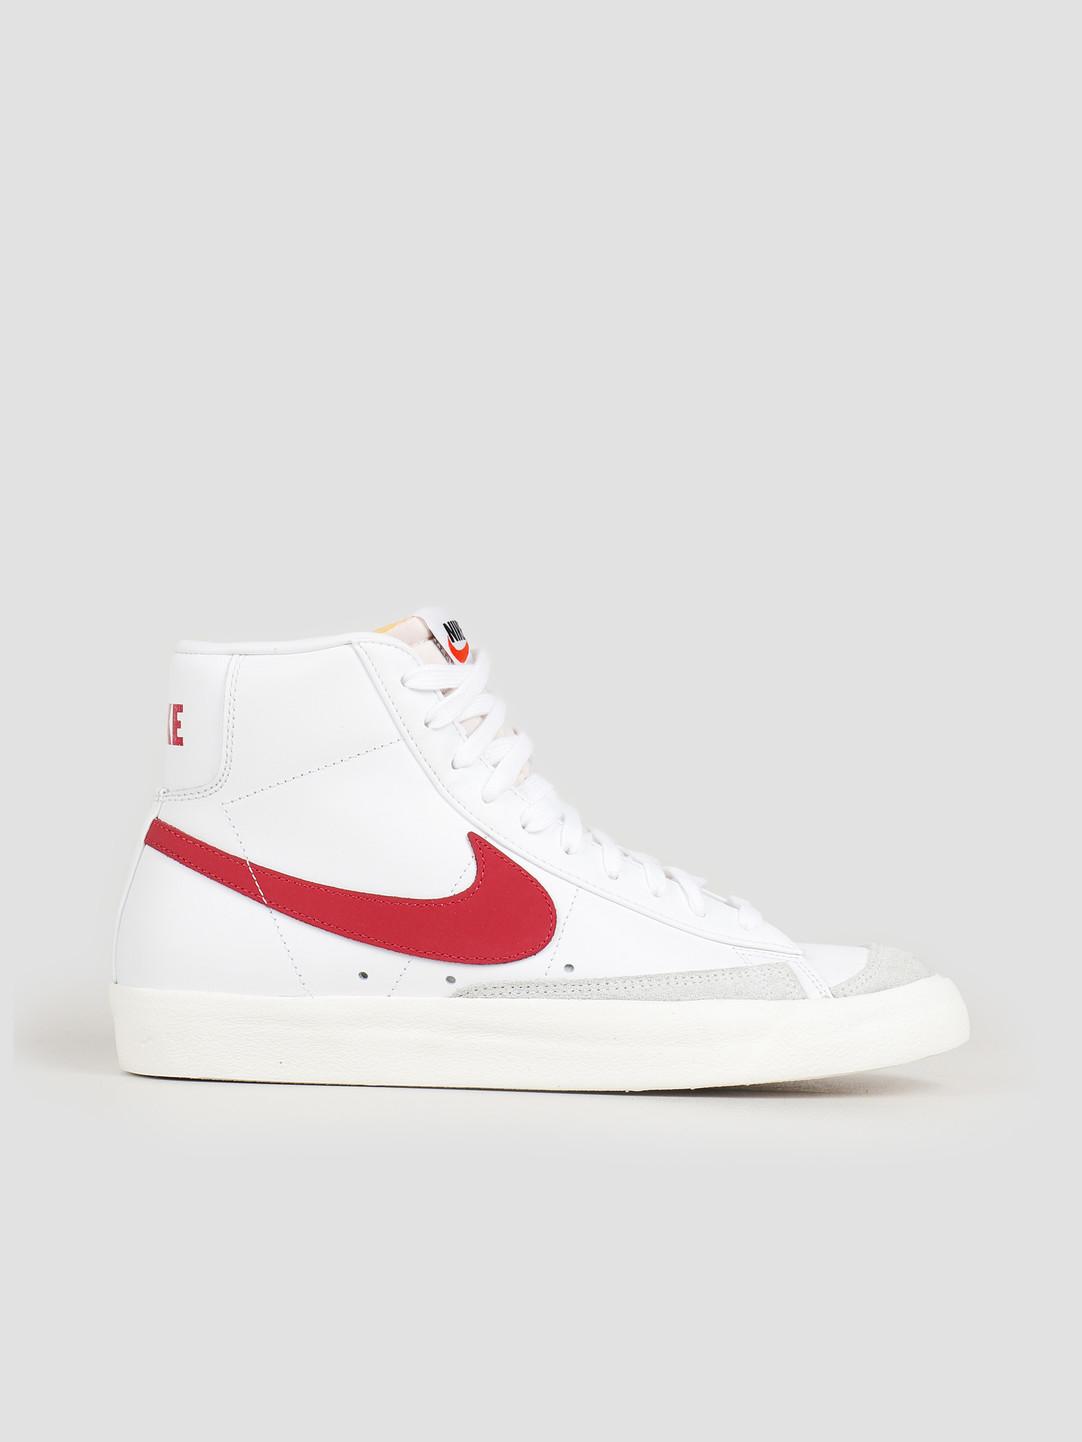 Nike Nike Blazer Mid '77 Vintage White Worn Brick Sail BQ6806-102